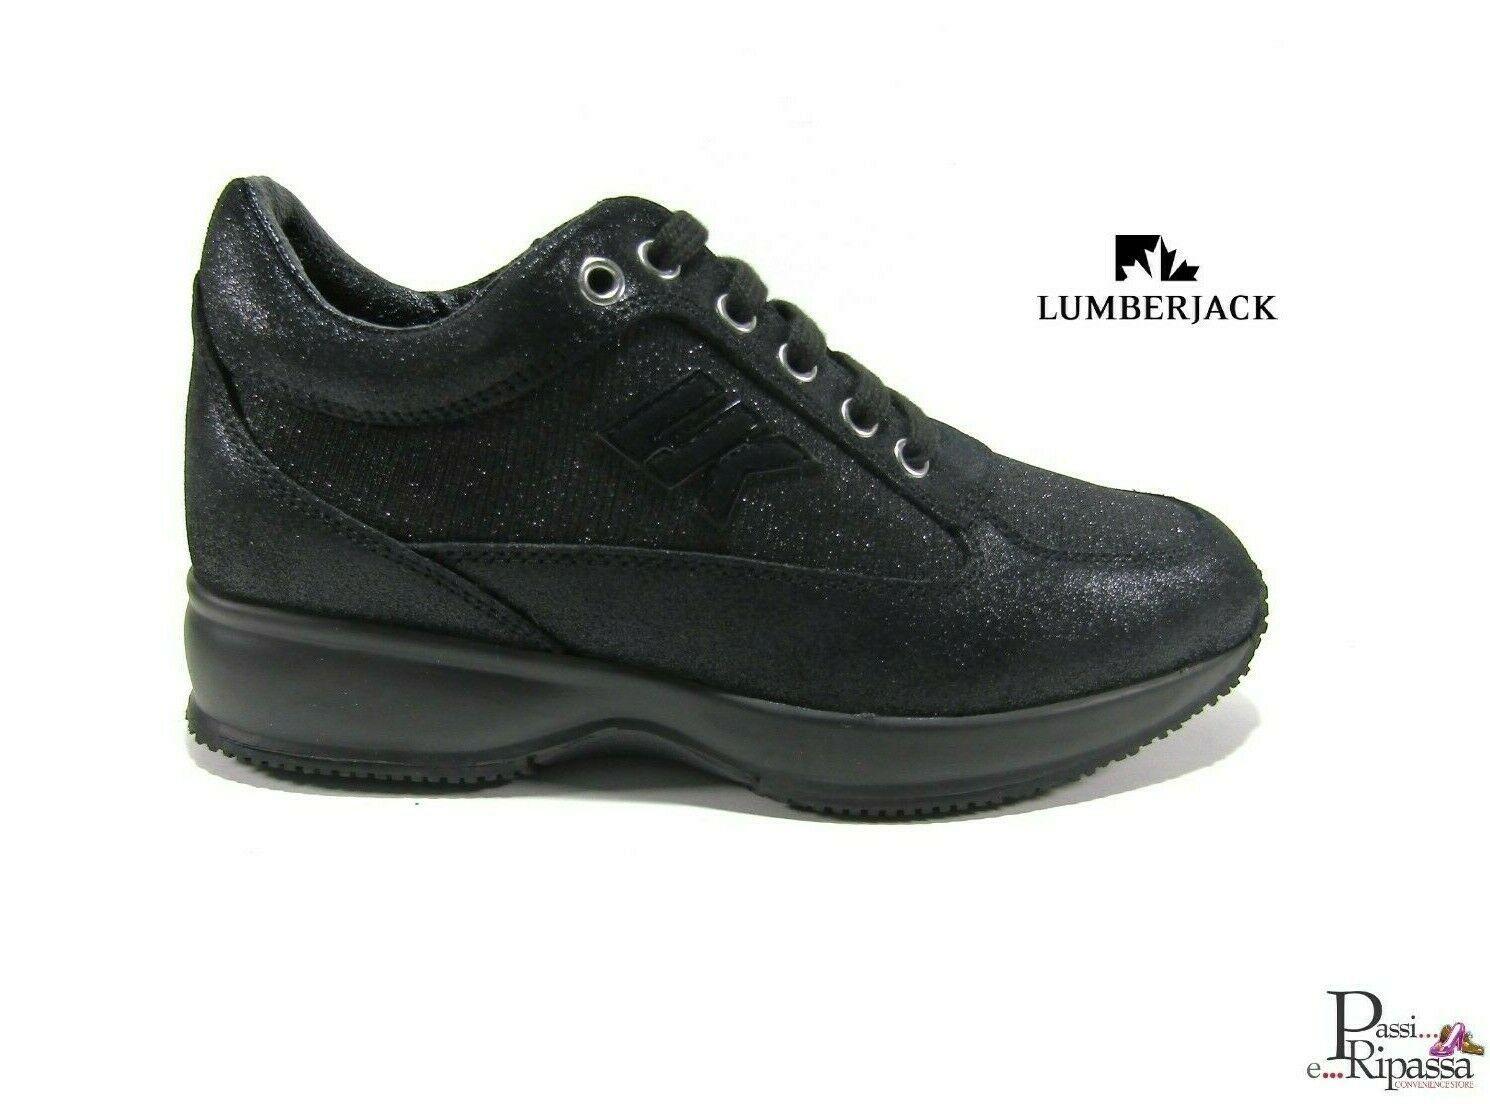 adidas donna scarpe con zeppa interna